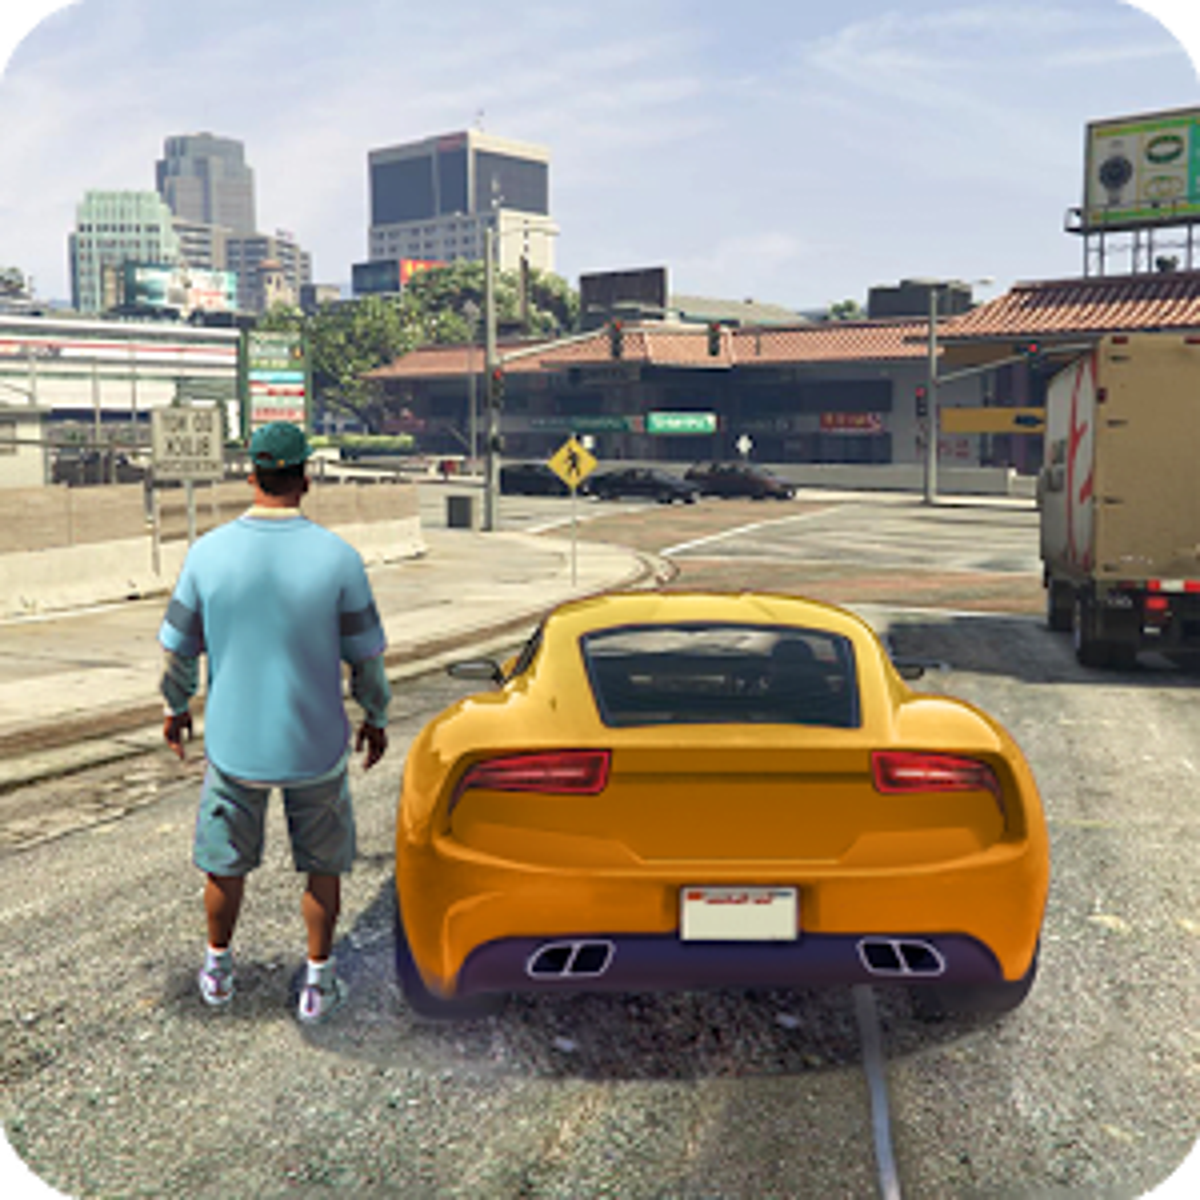 Vegas crime city simulator 1.0.4